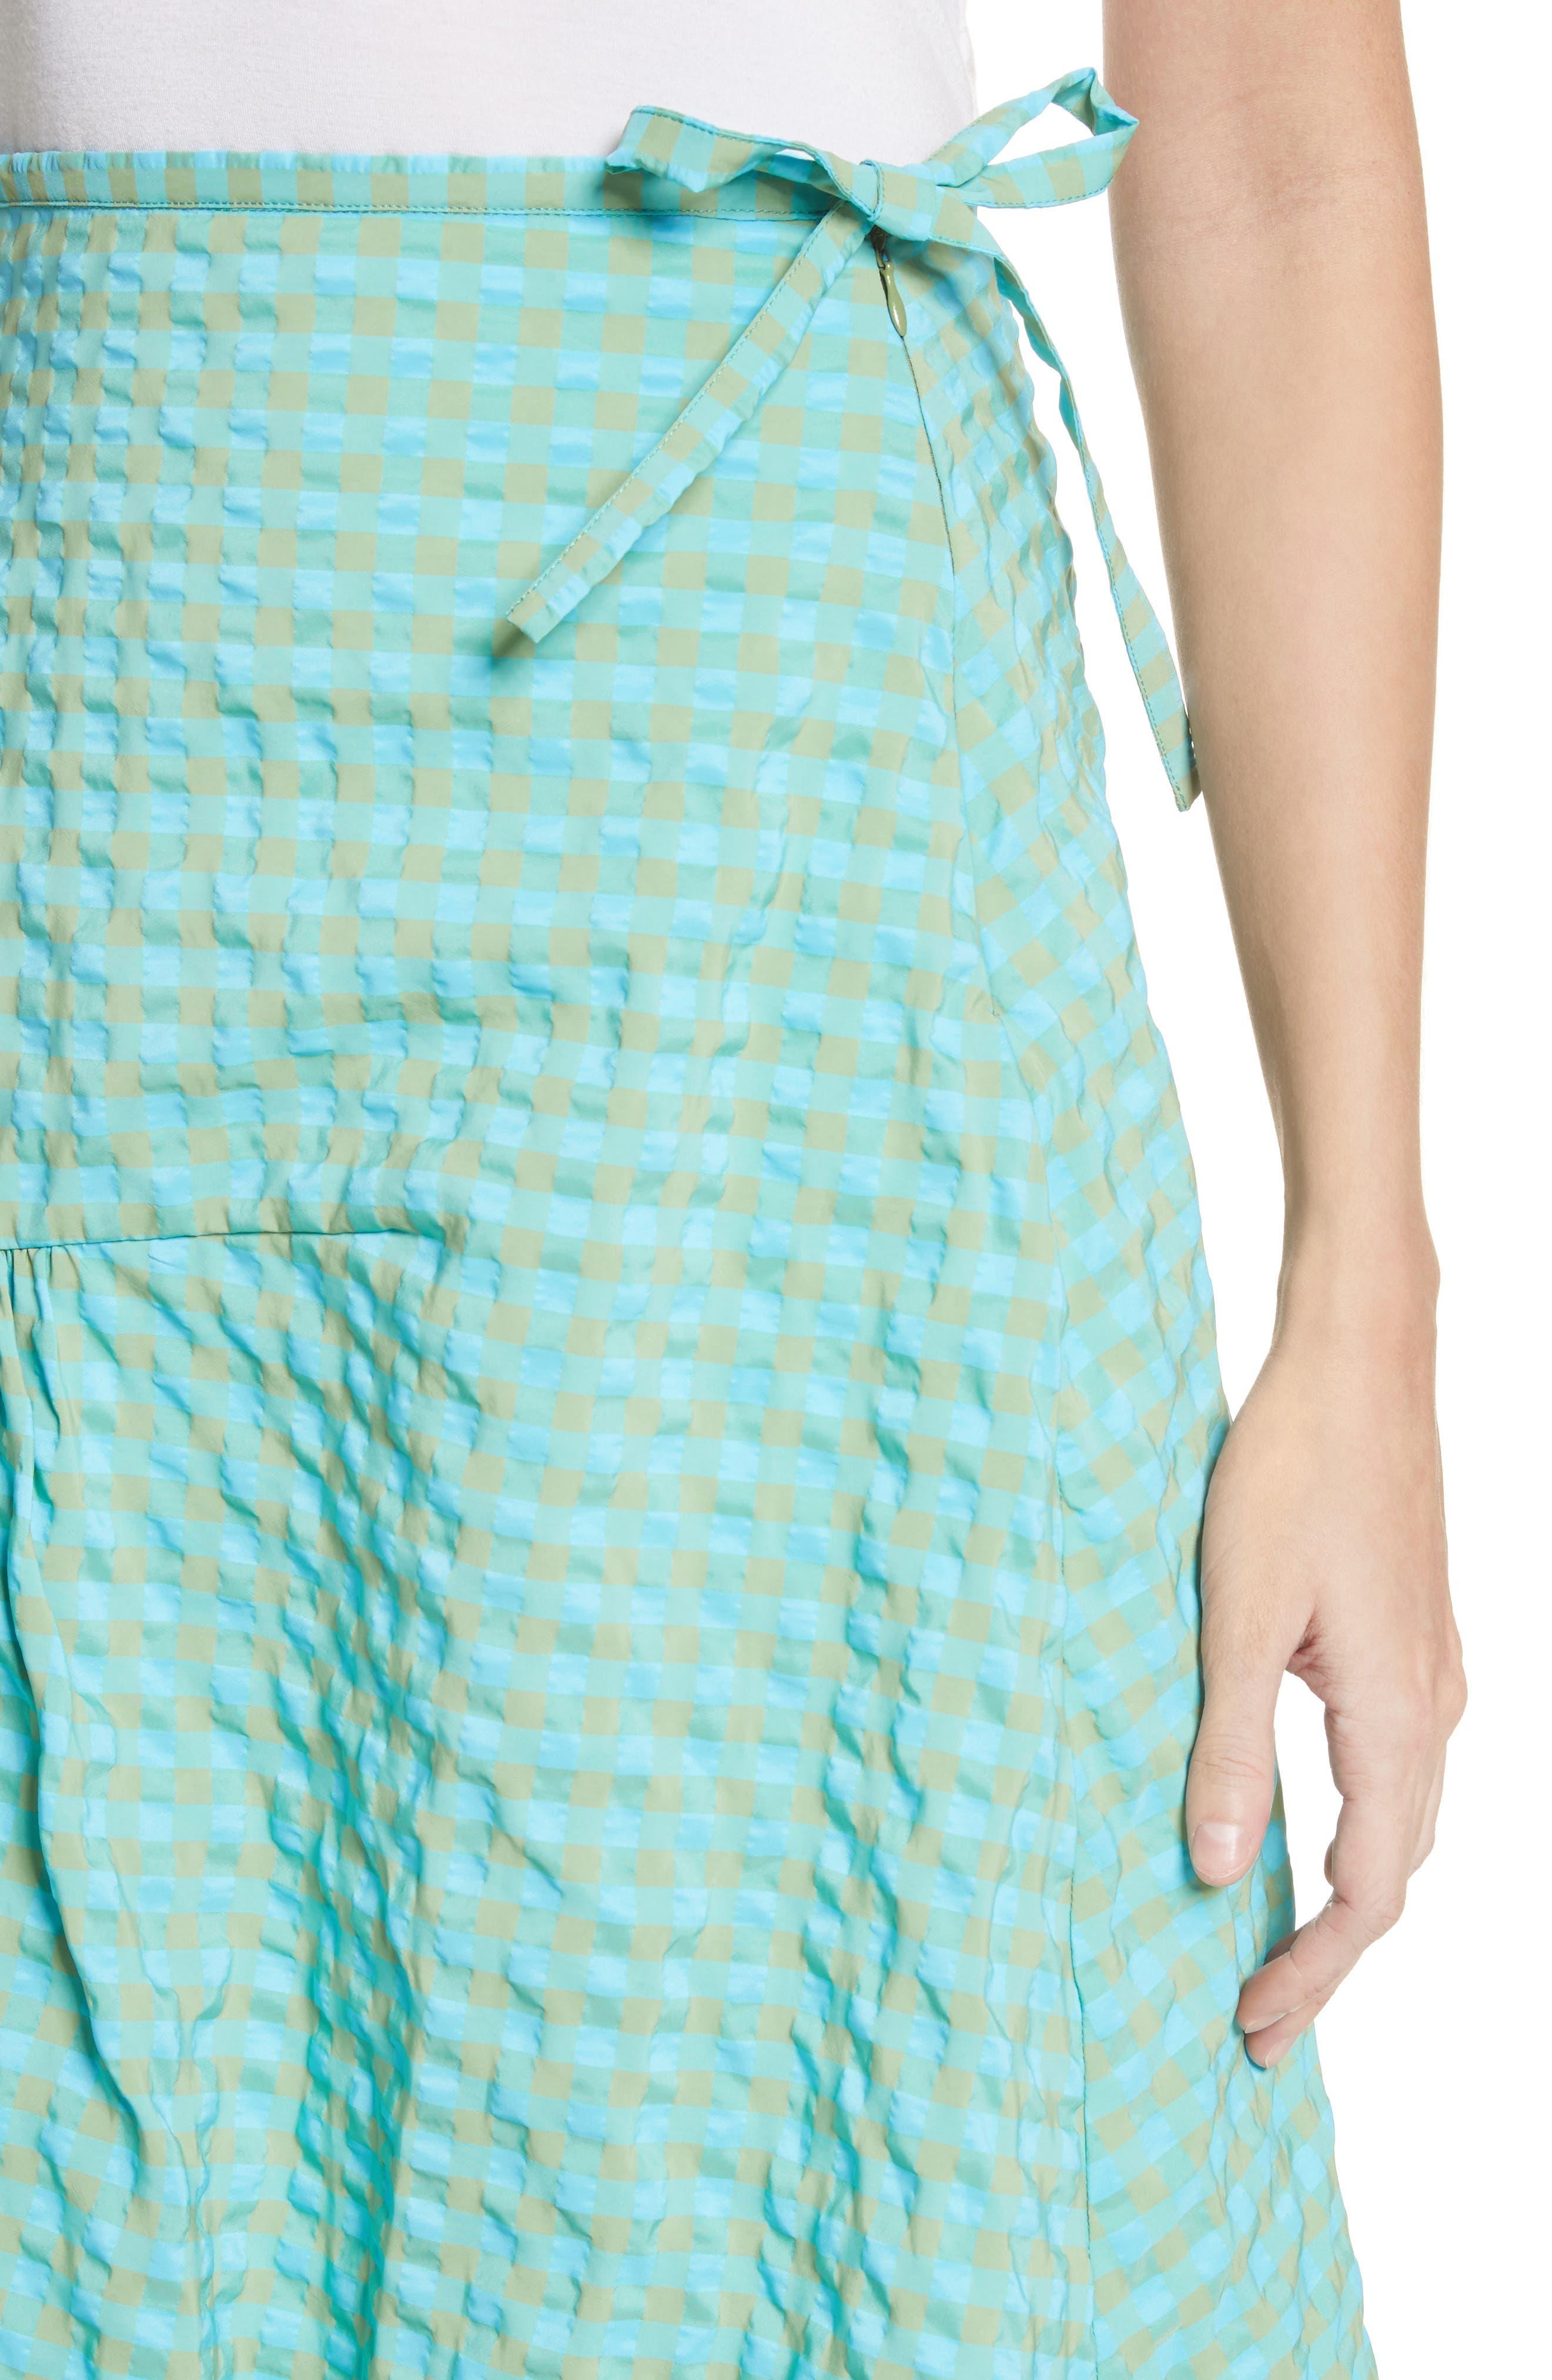 Marques'Almeida Long Asymmetrical Frill Skirt,                             Alternate thumbnail 4, color,                             Turquoise Gingham